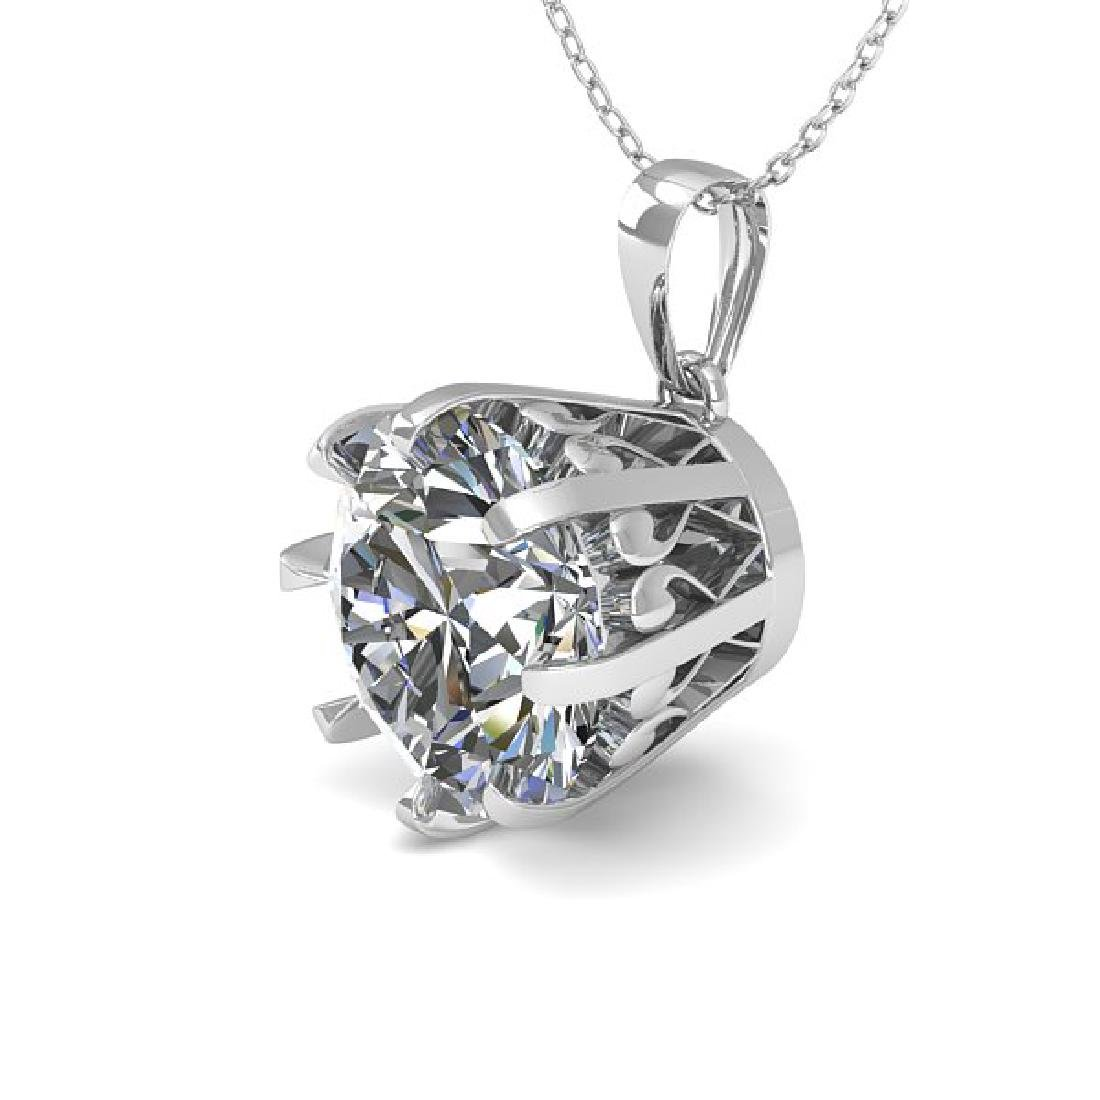 2 CTW VS/SI Diamond Solitaire Necklace 14K White Gold